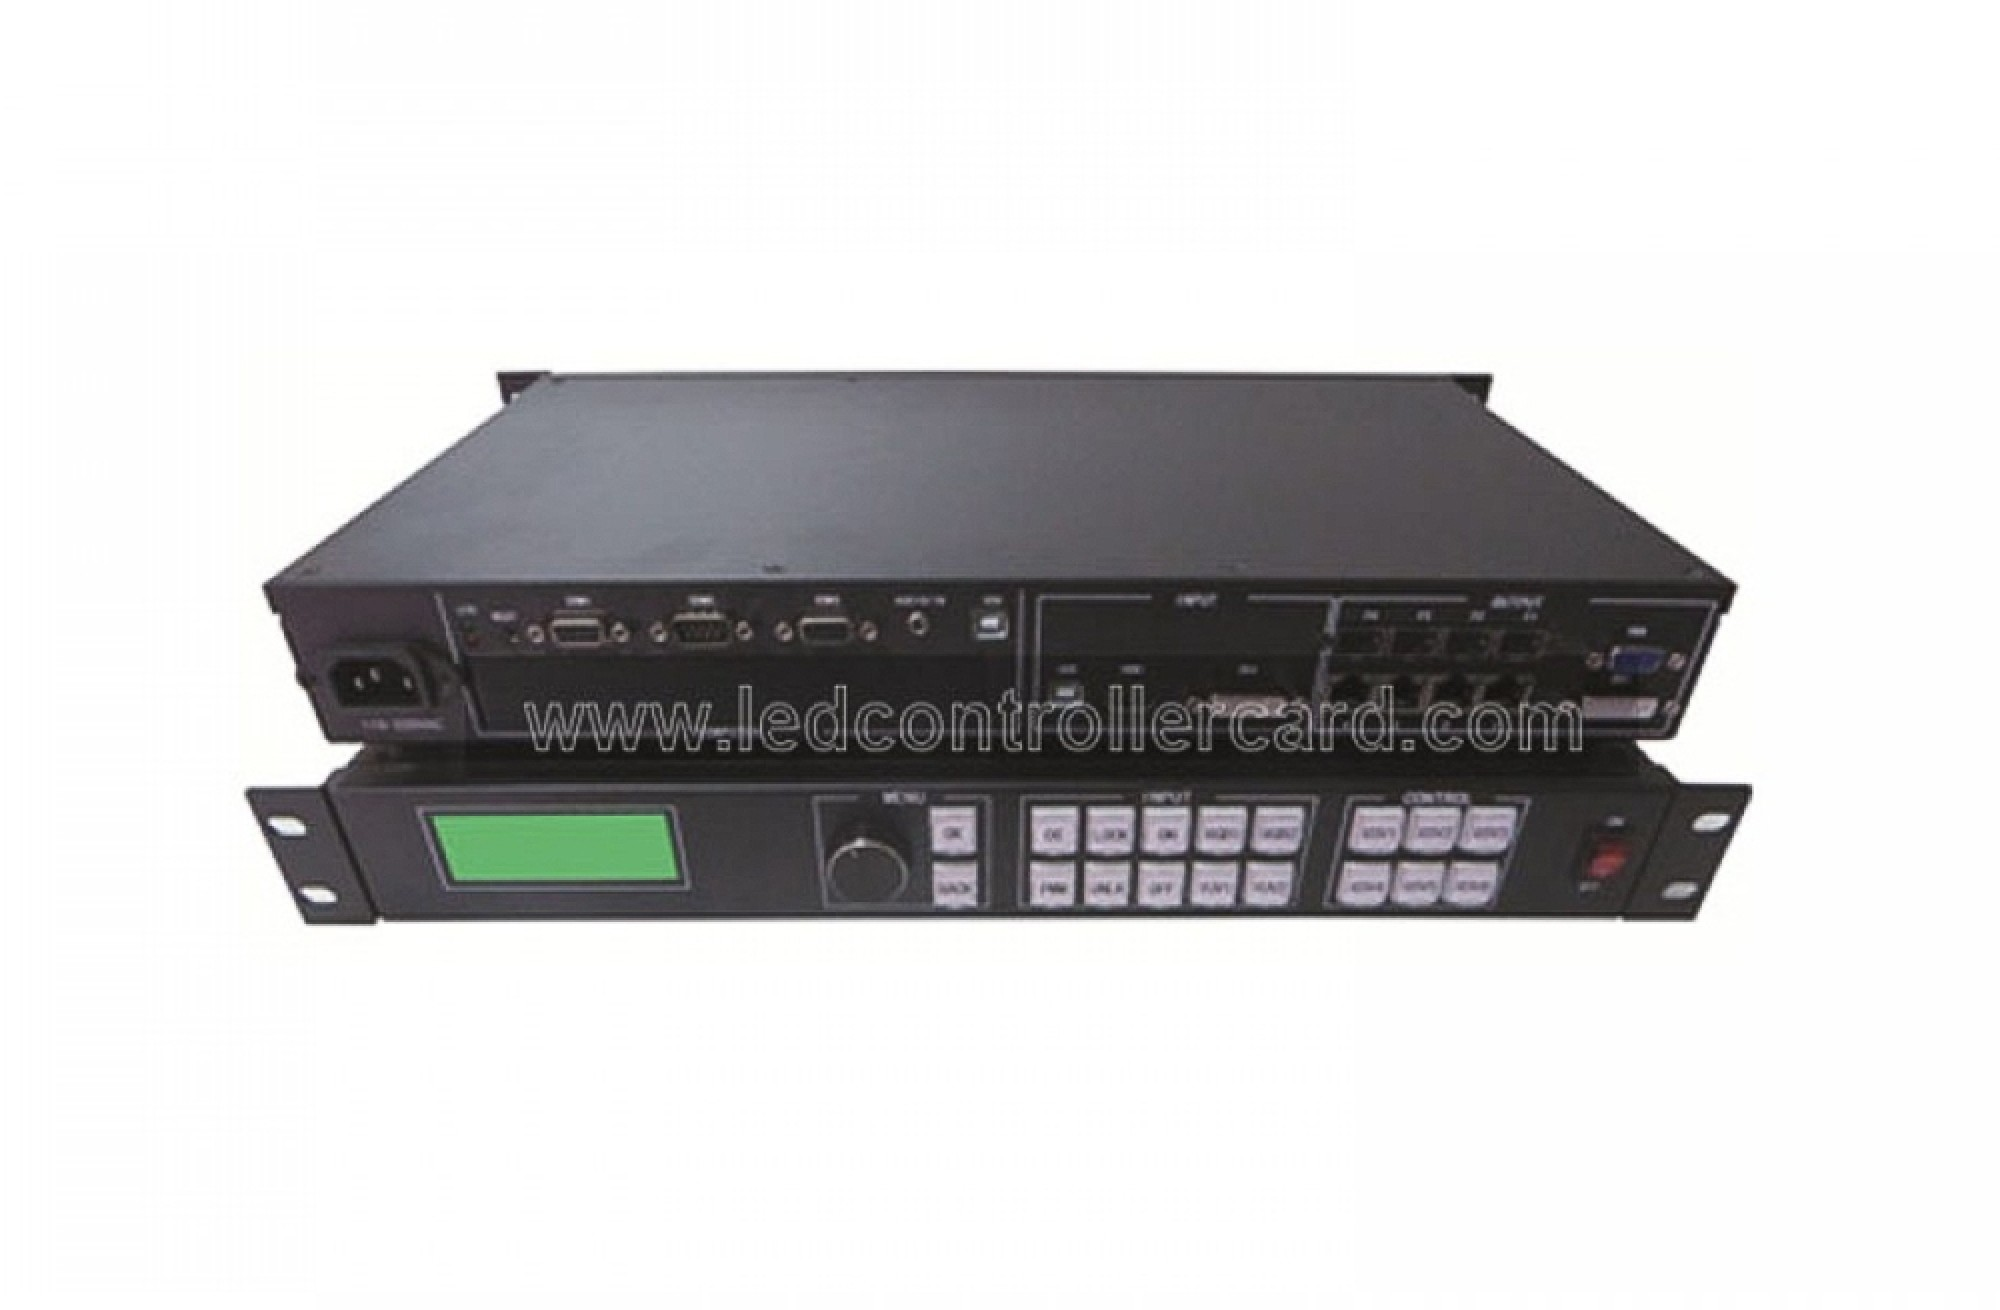 DBStar DBS-HVT13E 3D LED Display Controller Box